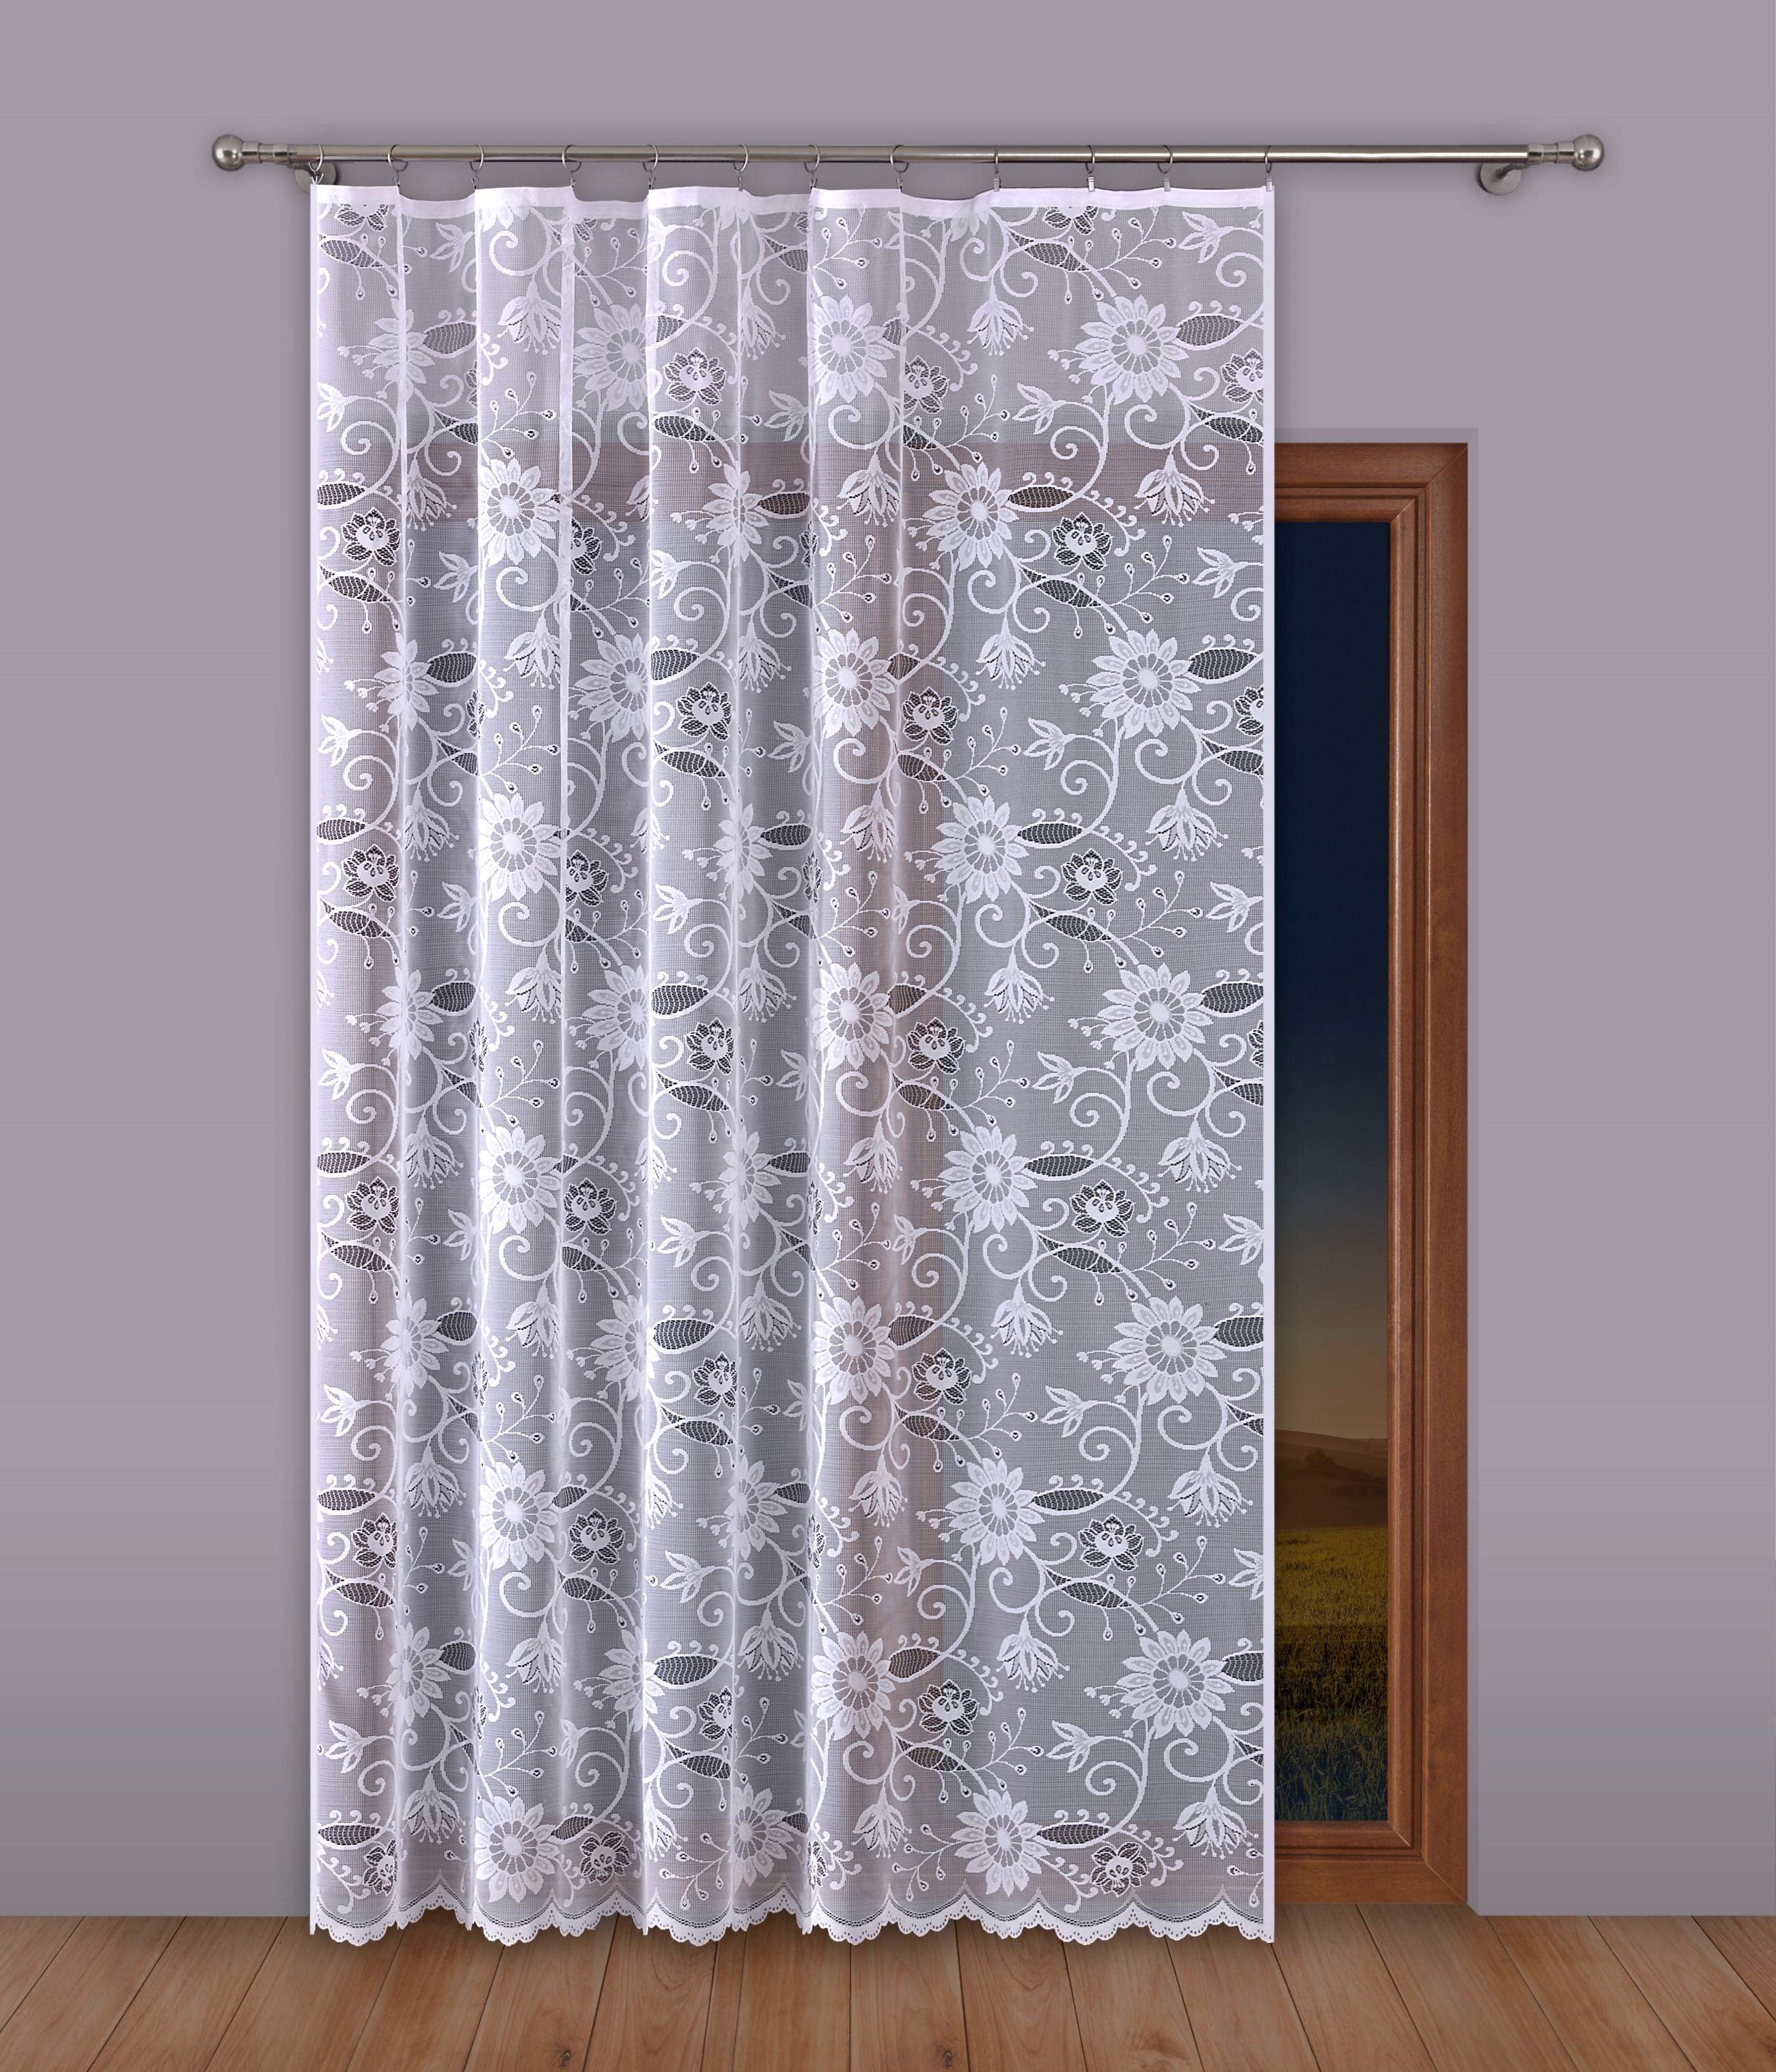 Шторы Primavera Классические шторы Beelzebub Цвет: Белый шторы primavera классические шторы larry цвет белый